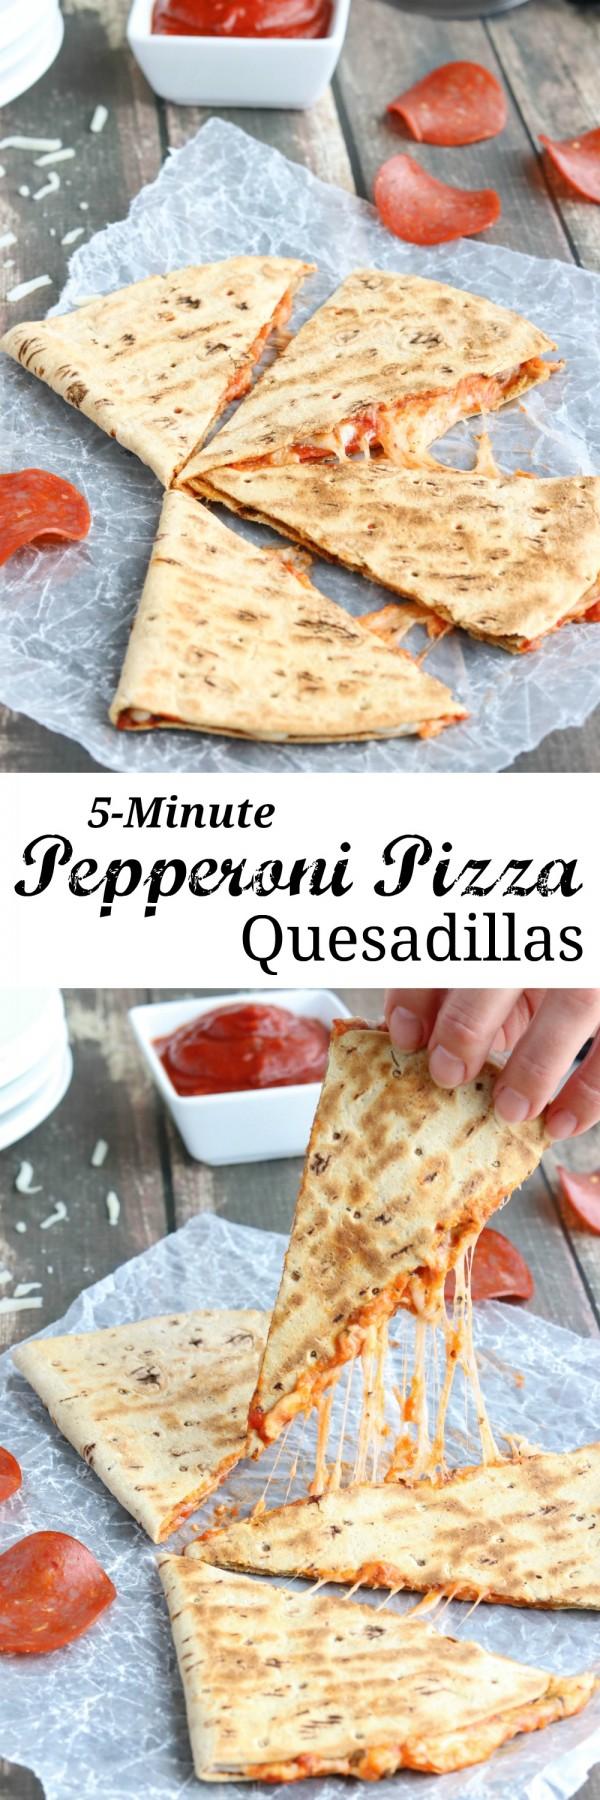 Get the recipe Pepperoni Pizza Quesadillas @recipes_to_go